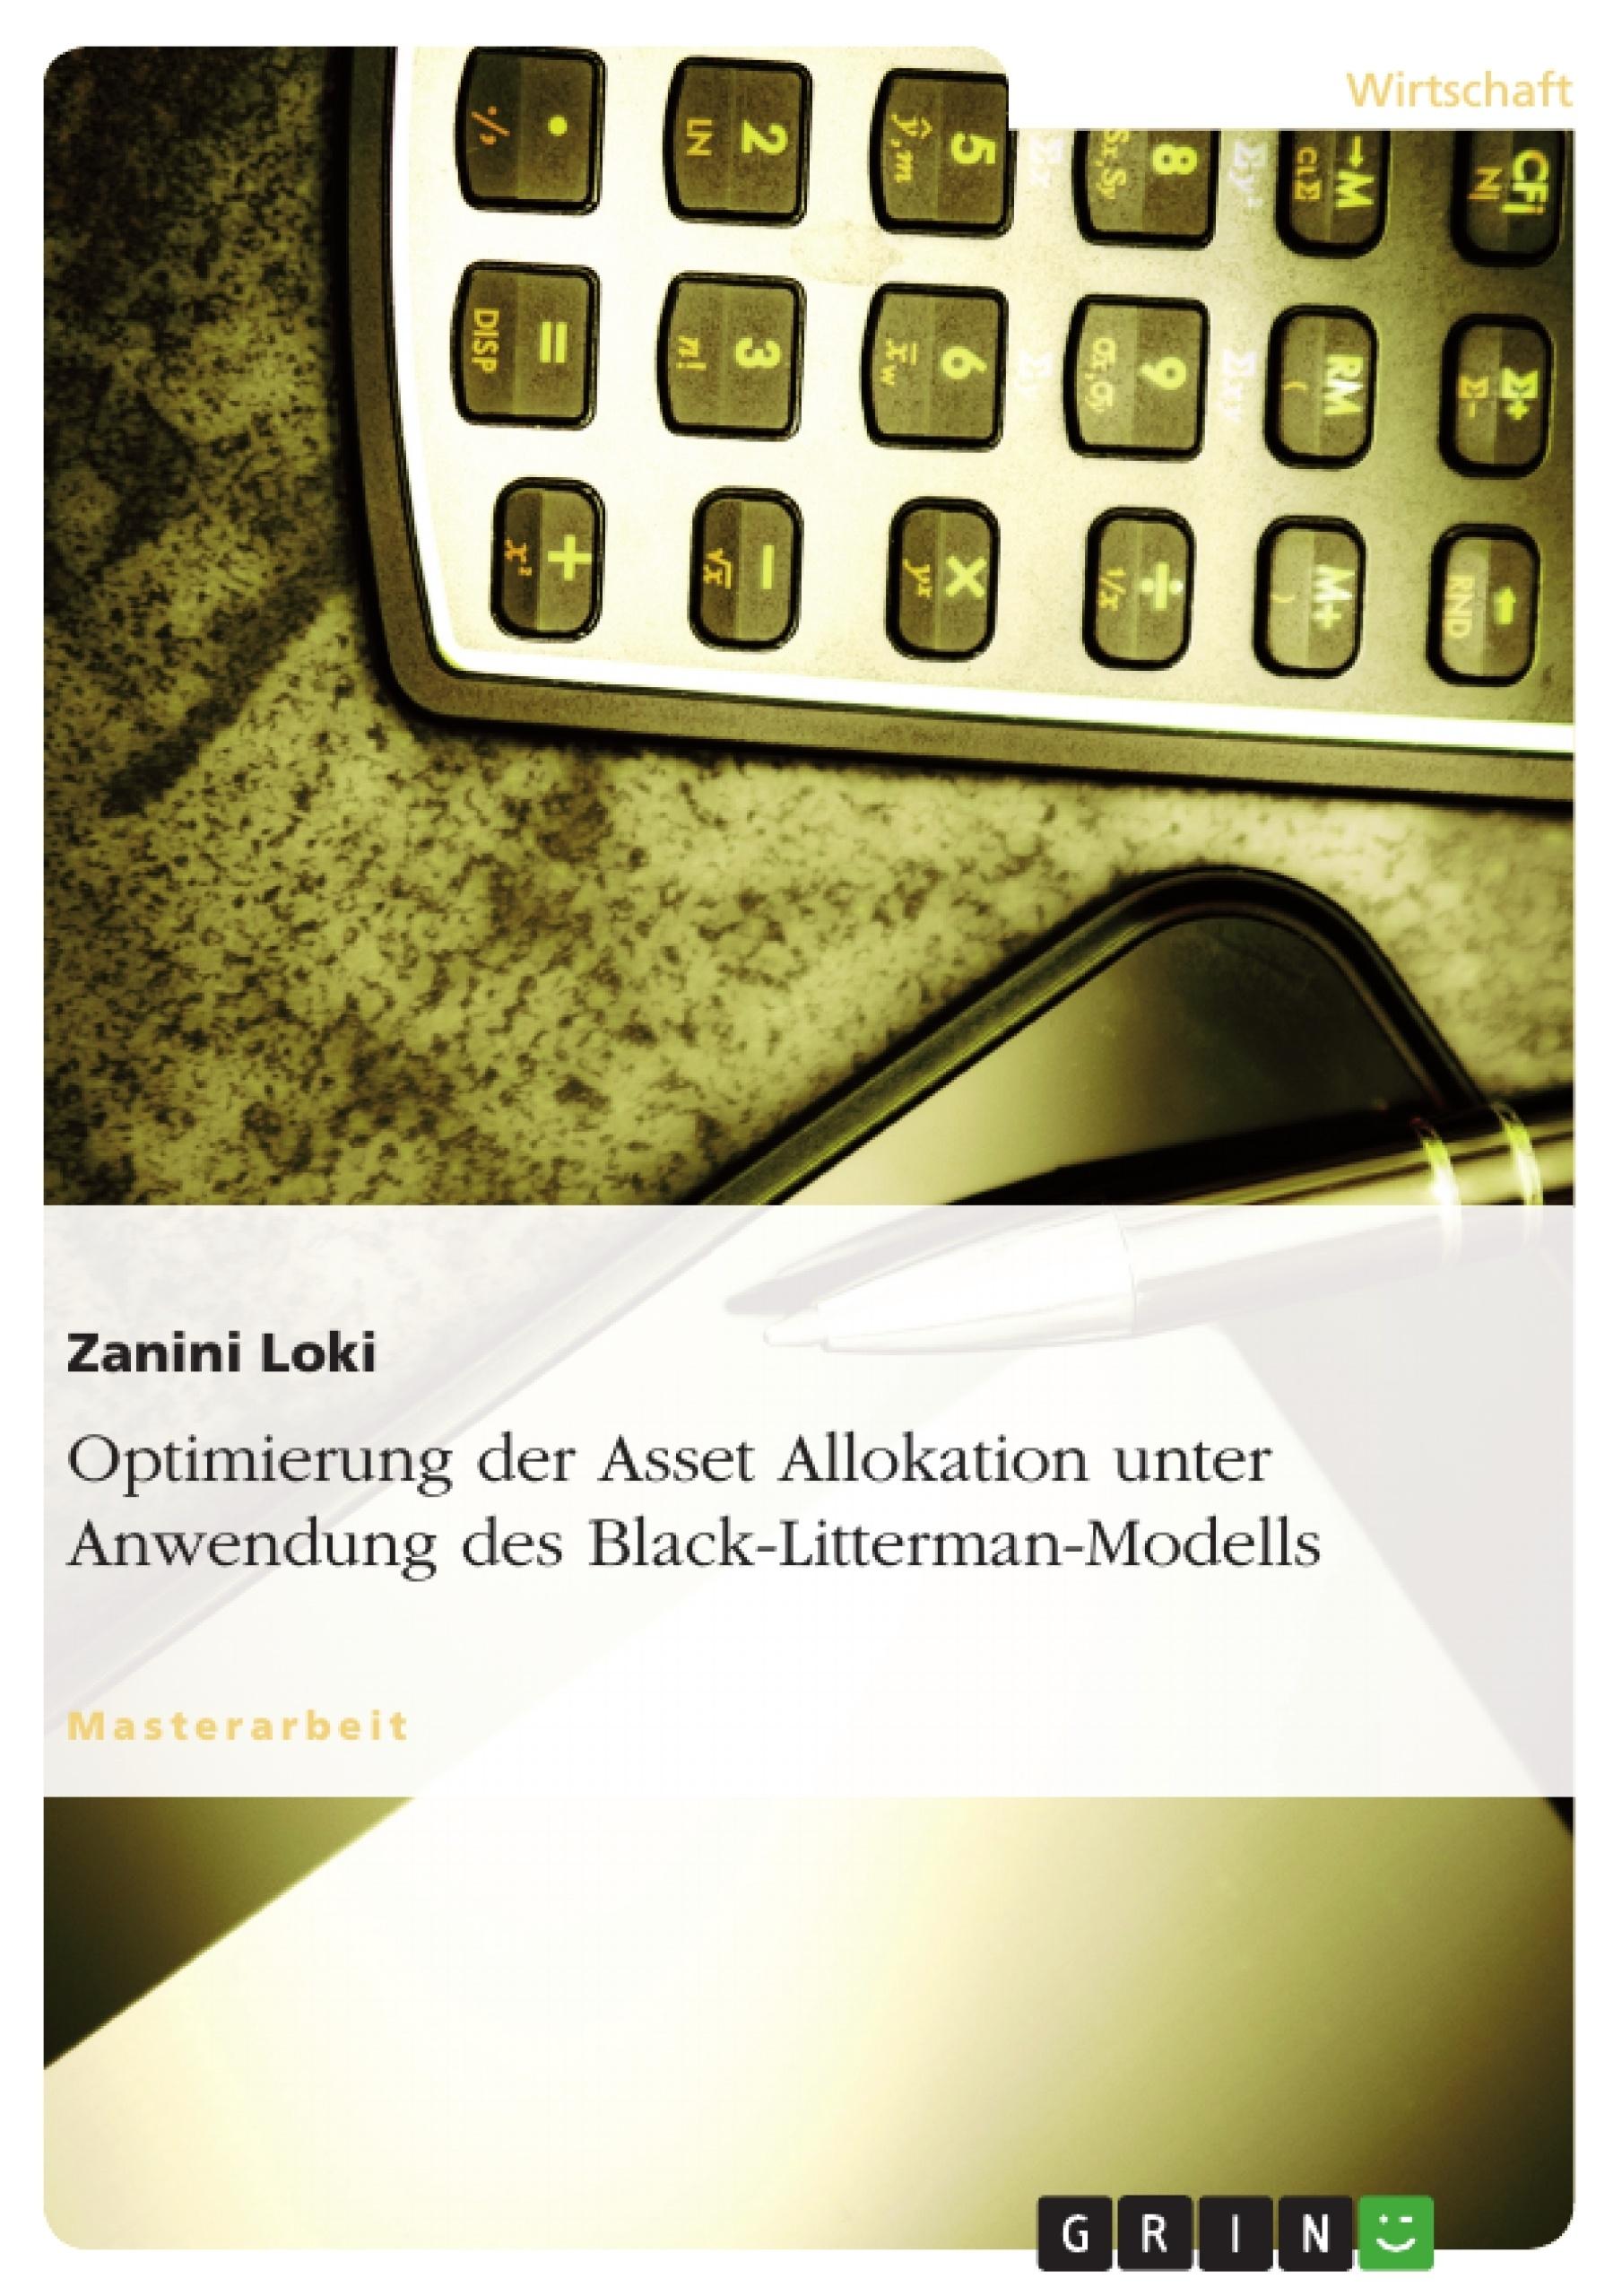 Titel: Optimierung der Asset Allokation unter Anwendung des Black-Litterman-Modells